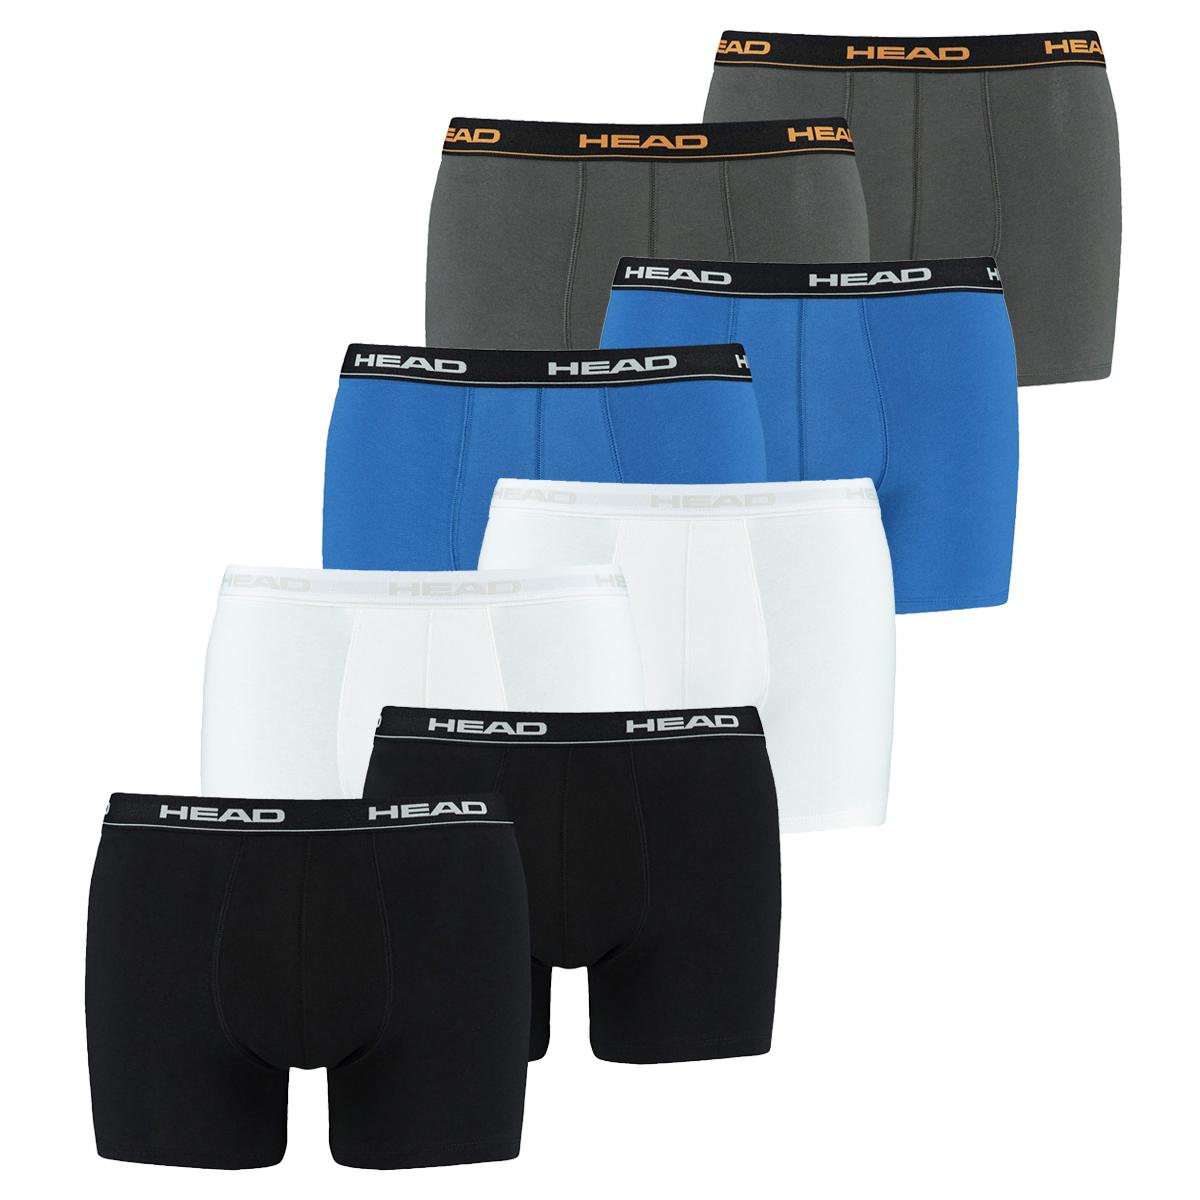 6a754ec073a 8 er Pack Head Herren Boxer Boxershorts Basic Pant Unterwäsche ...